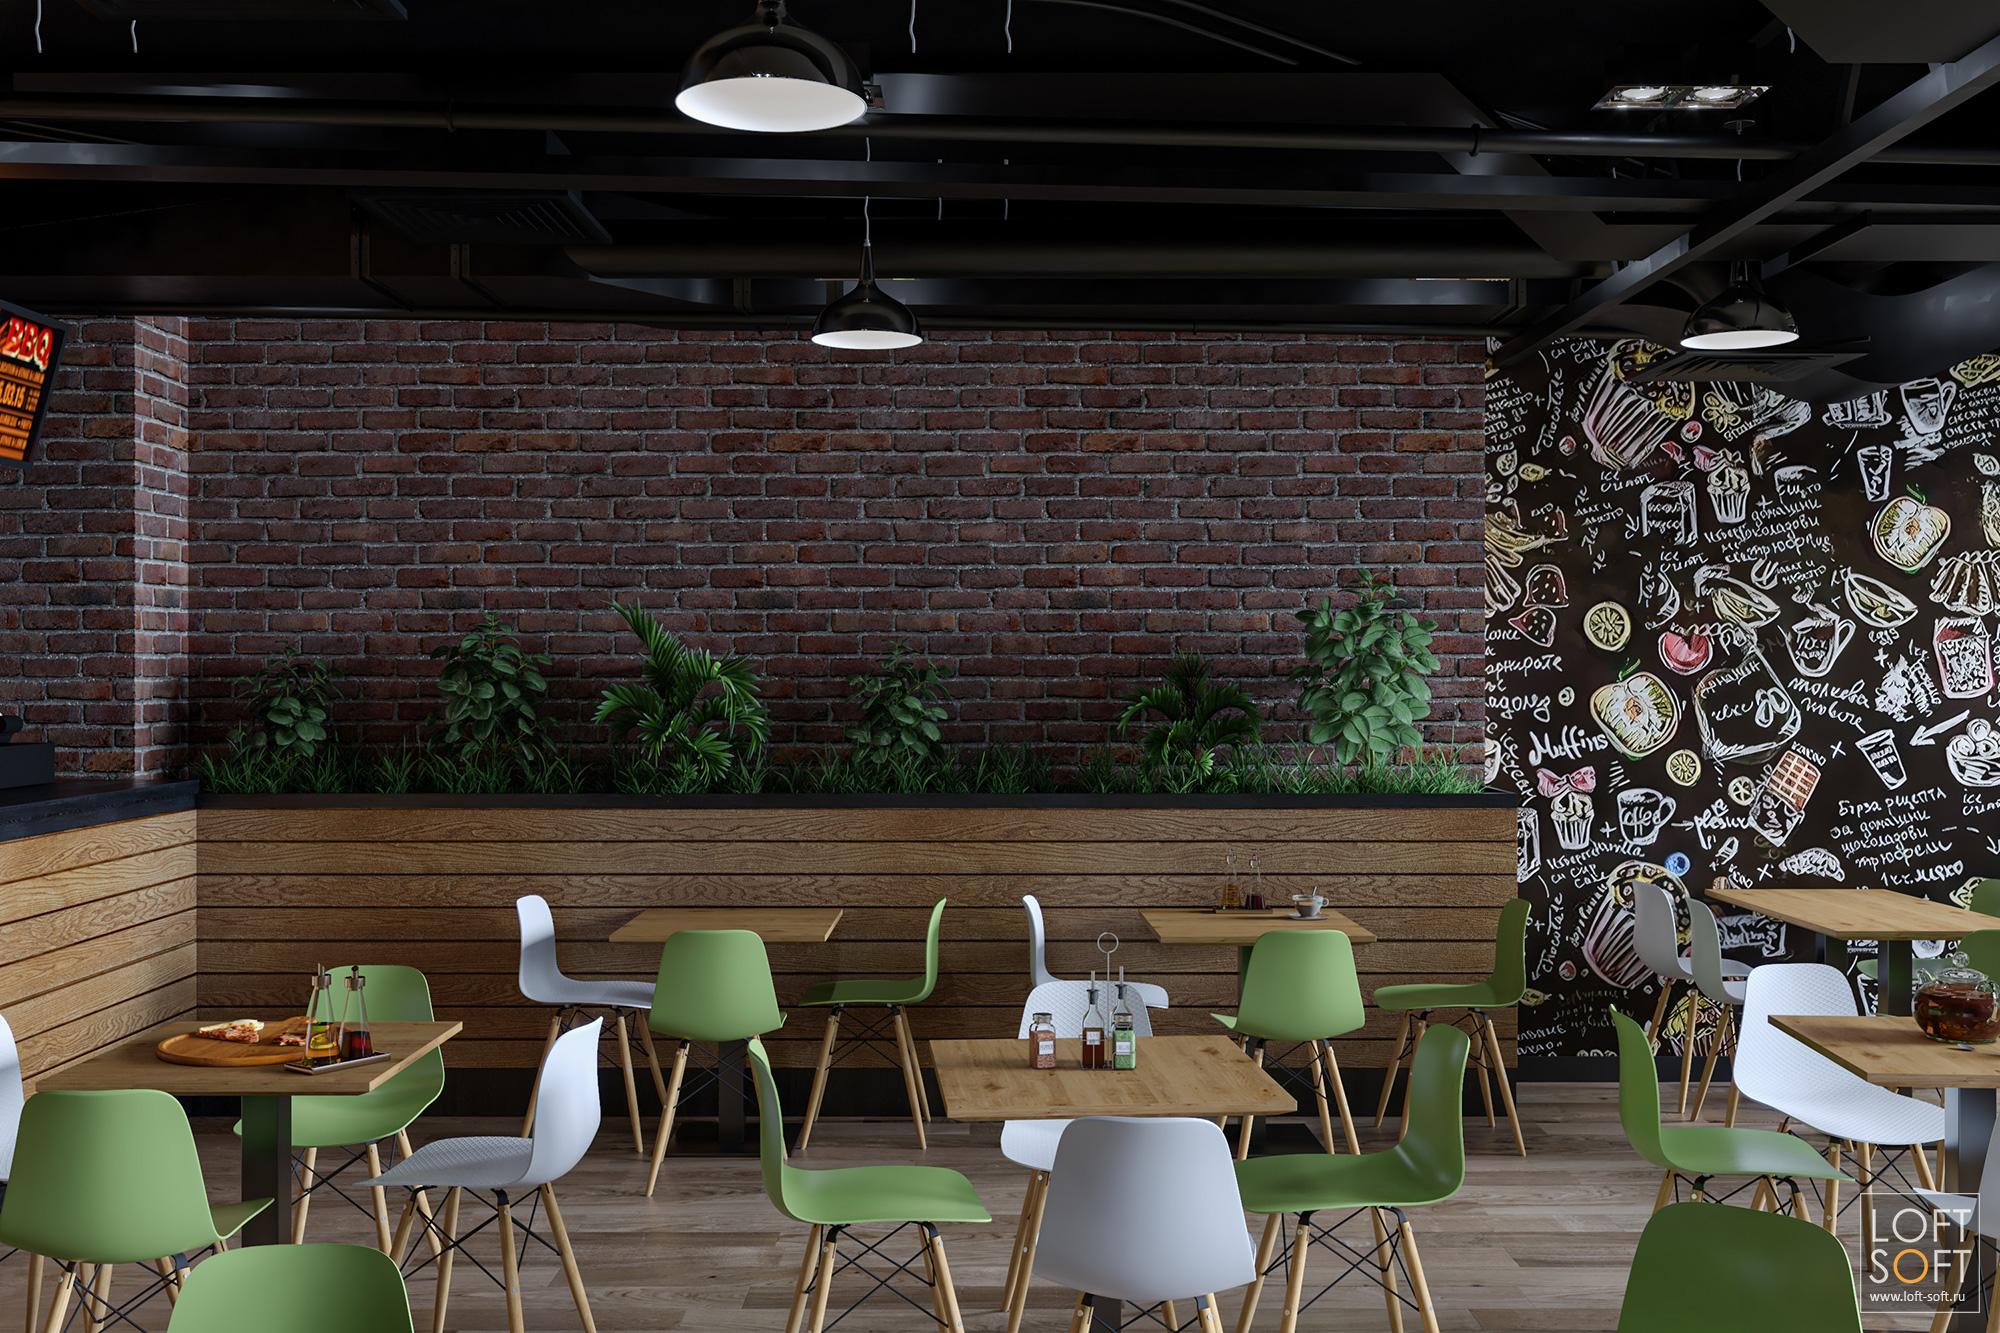 Дизайн-проект кафе или ресторана.